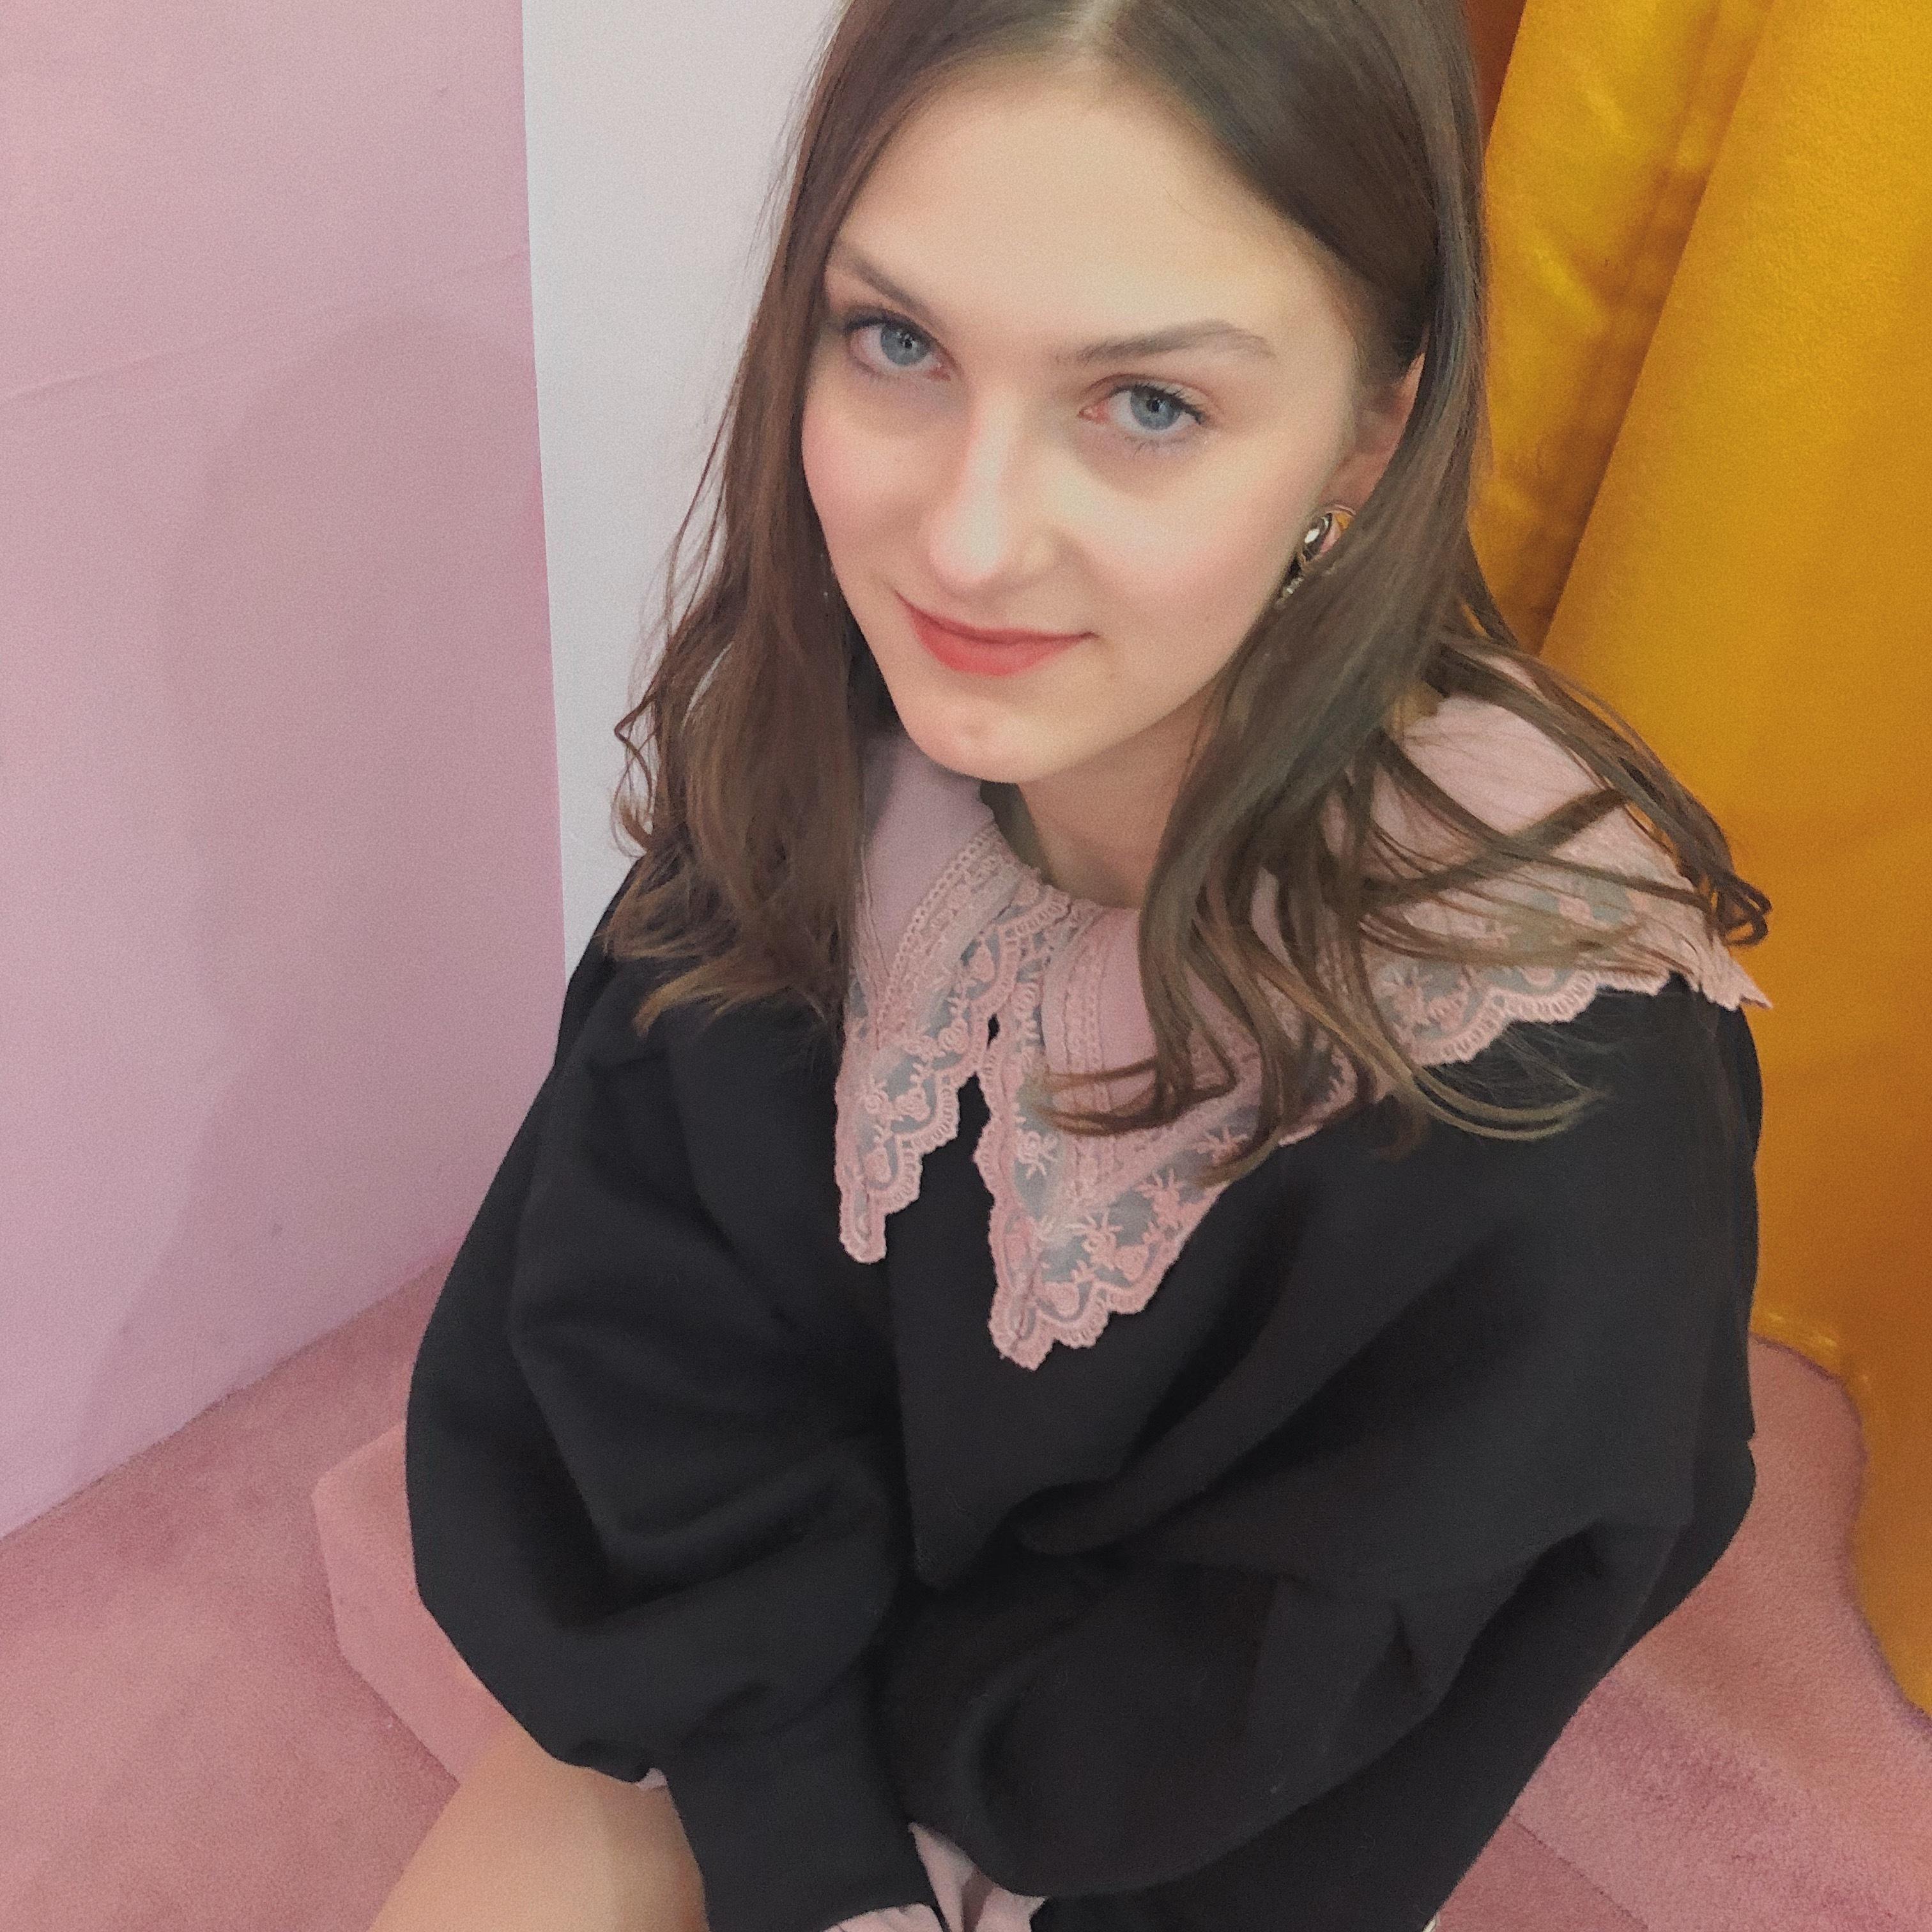 ♡cutie collar blouse (pink)